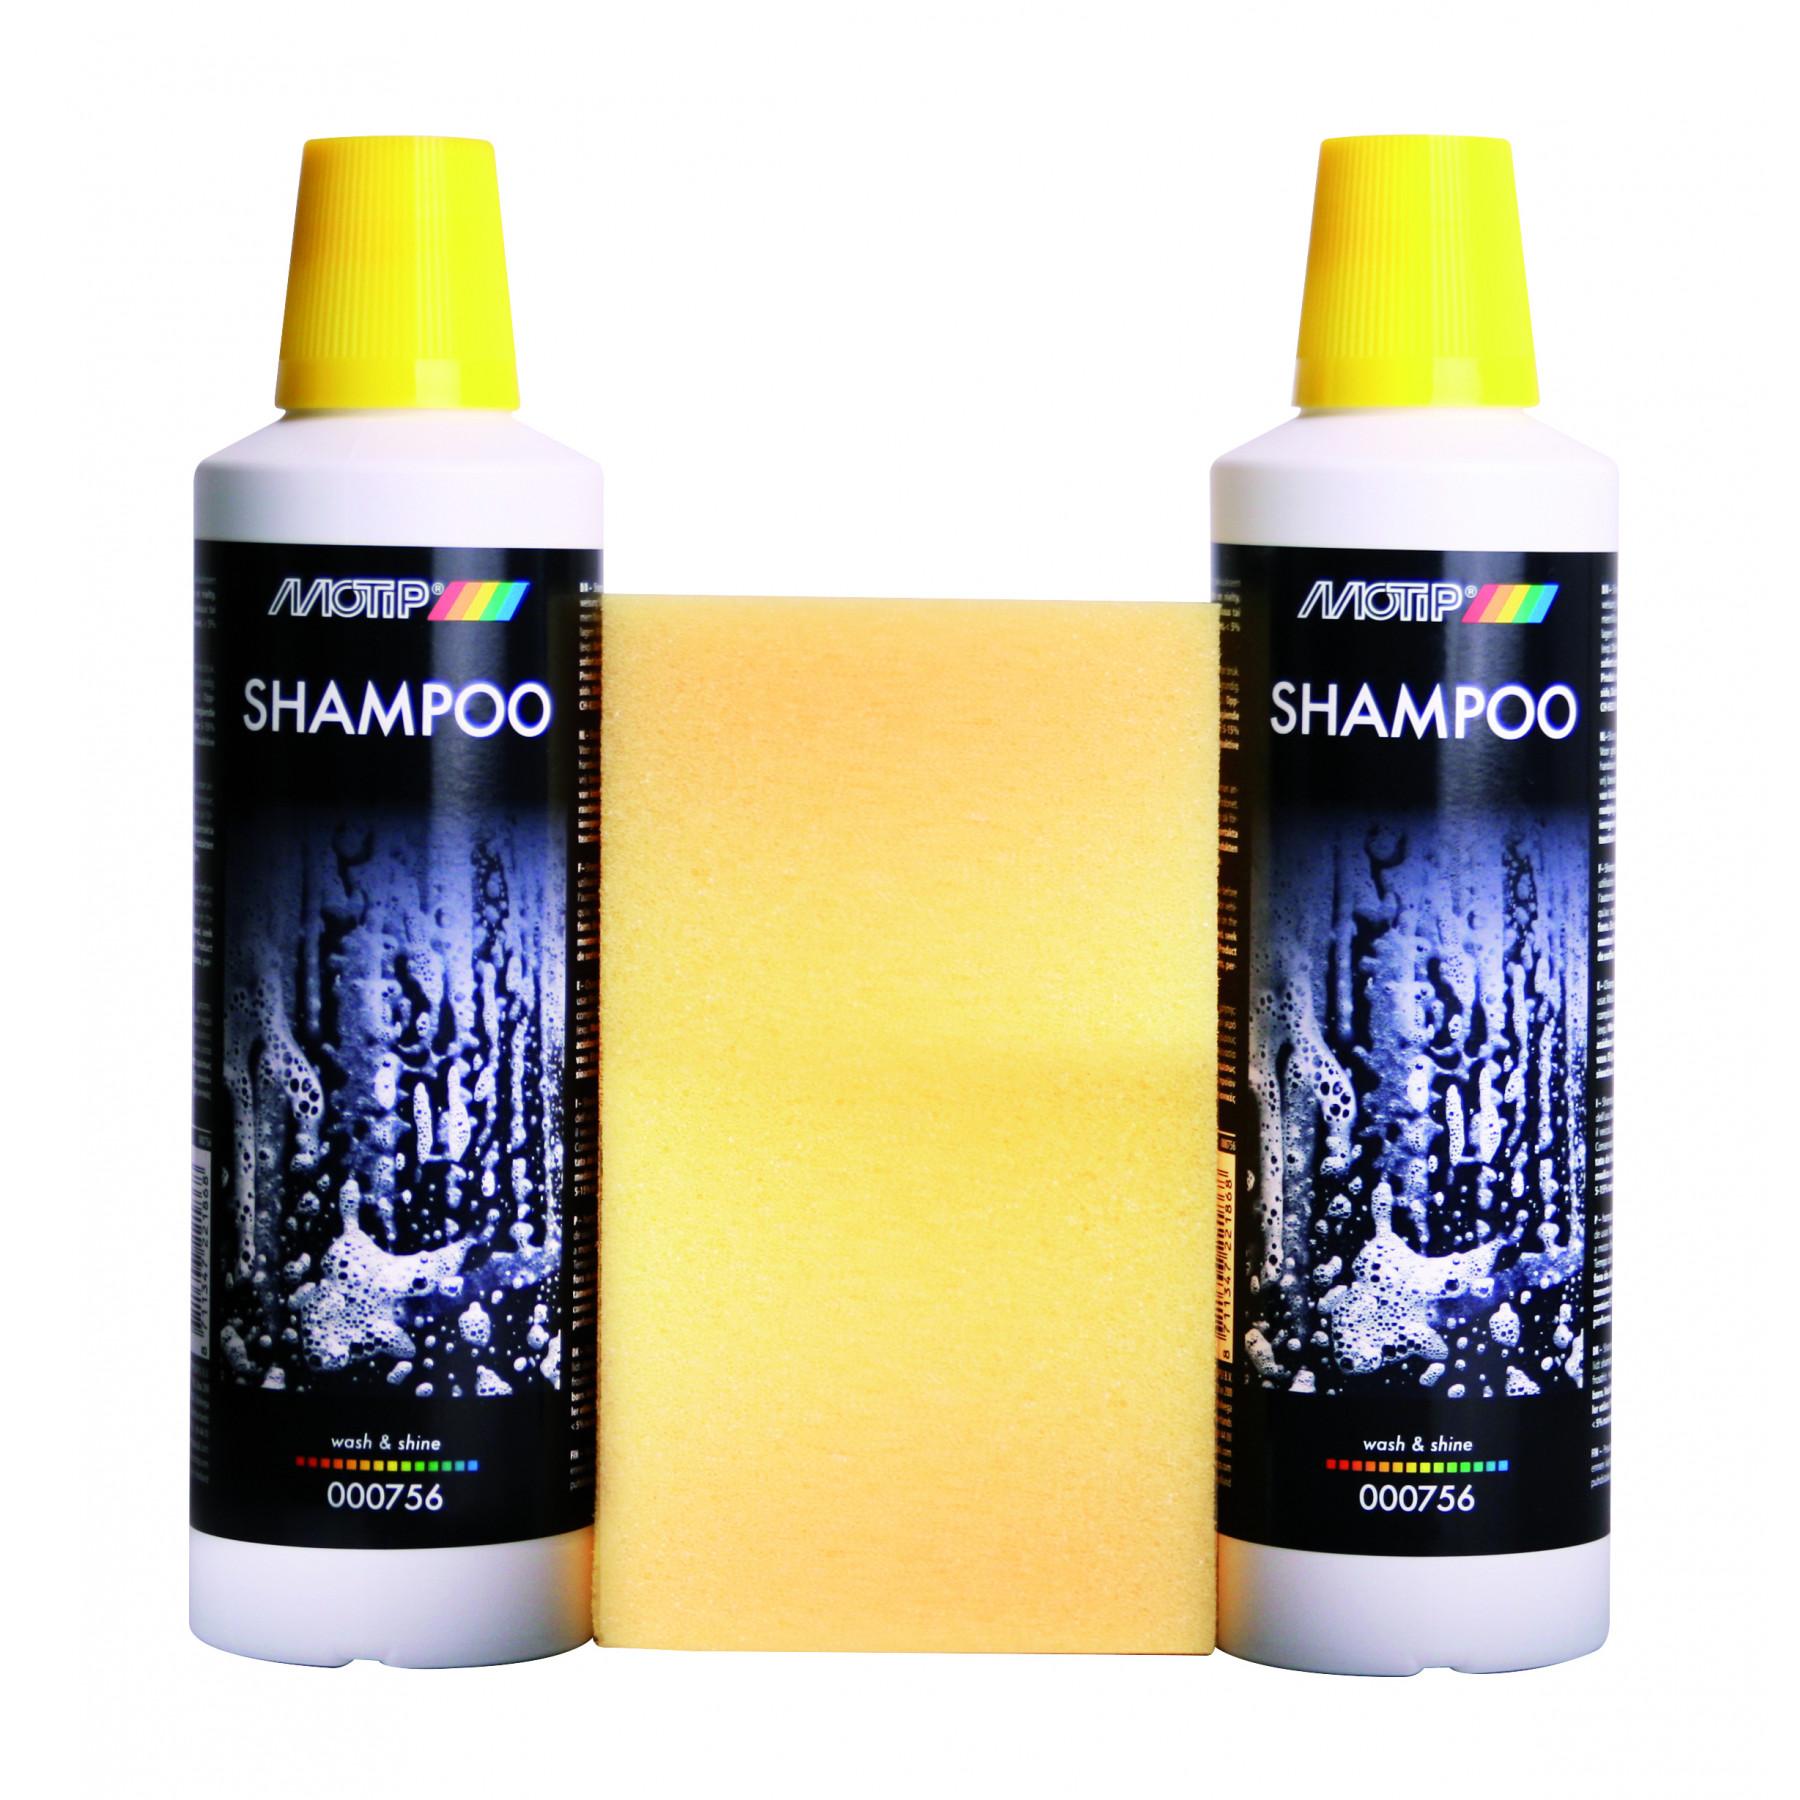 000756 Shampoo set 2 x 500 ml